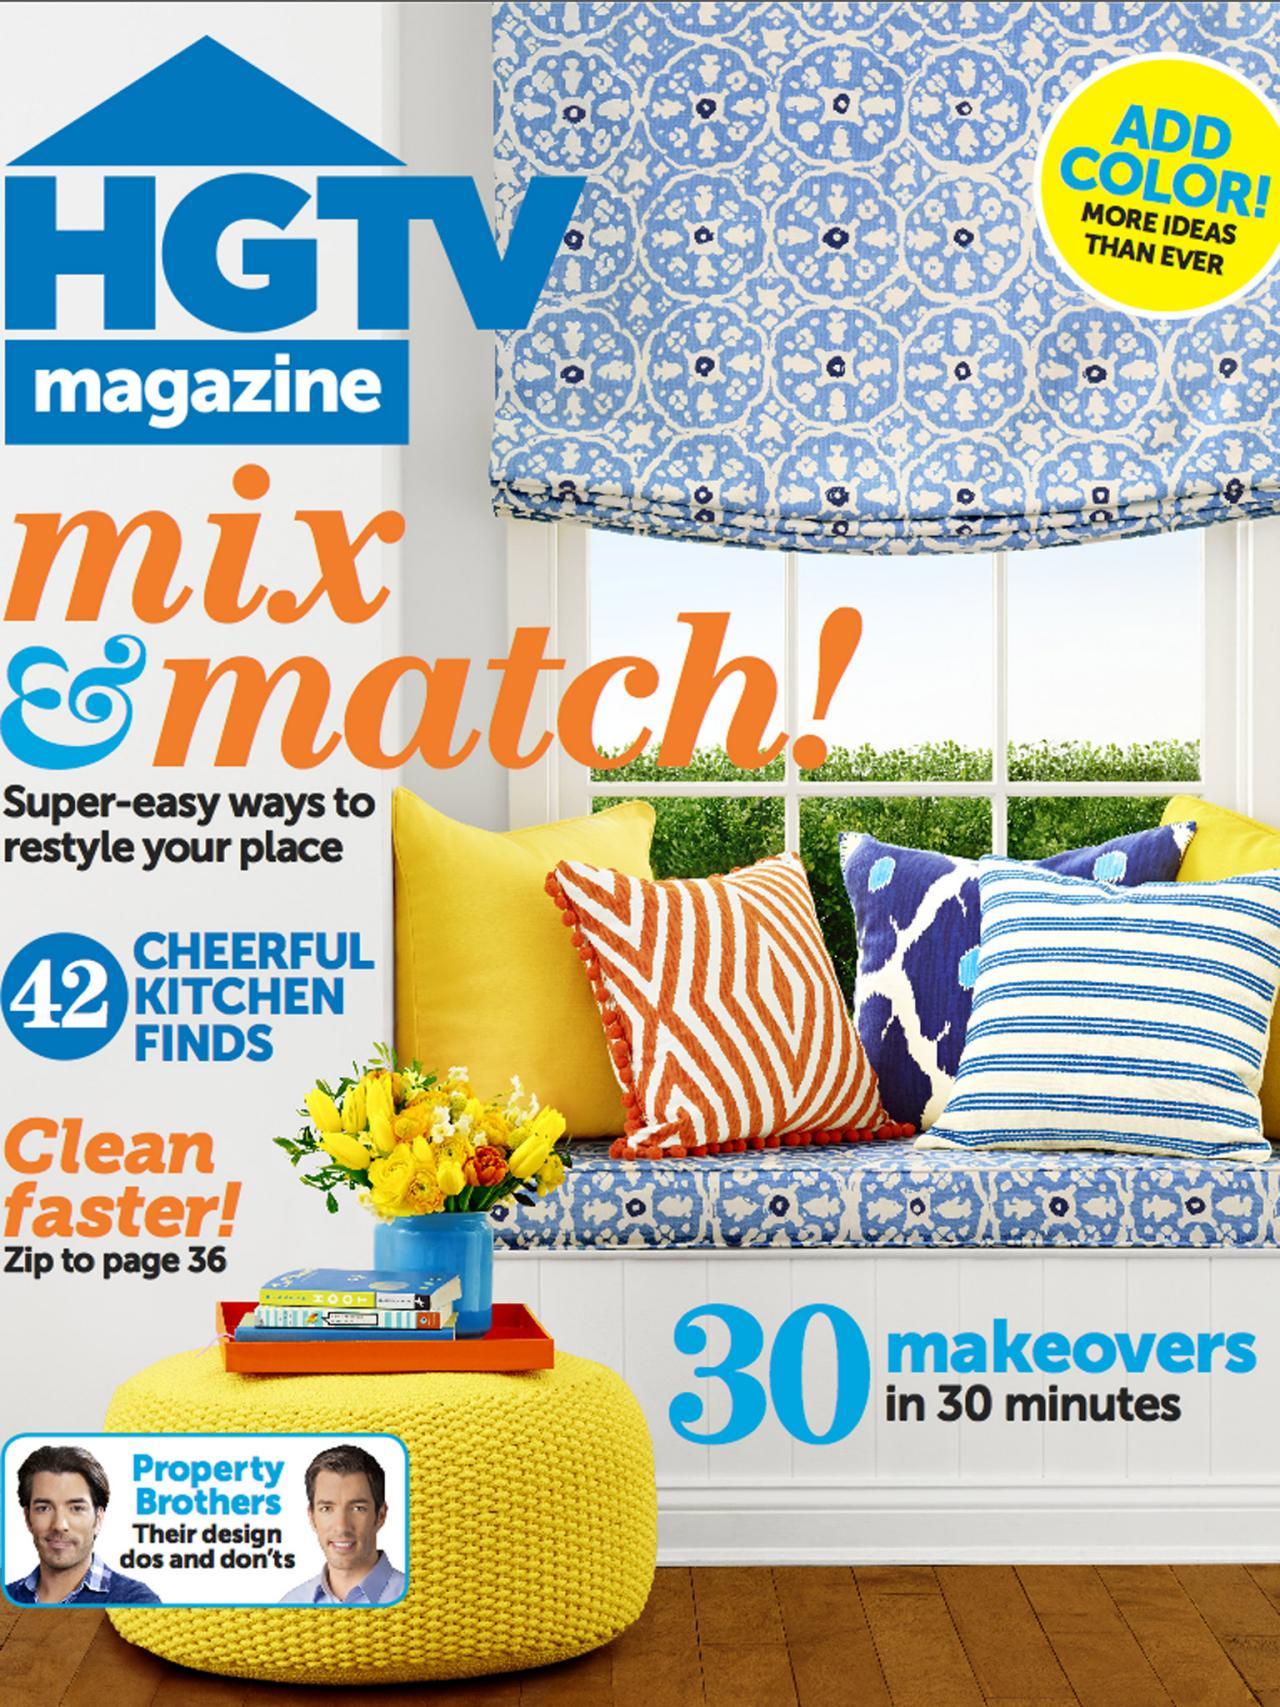 HGTV Magazine: April 2014